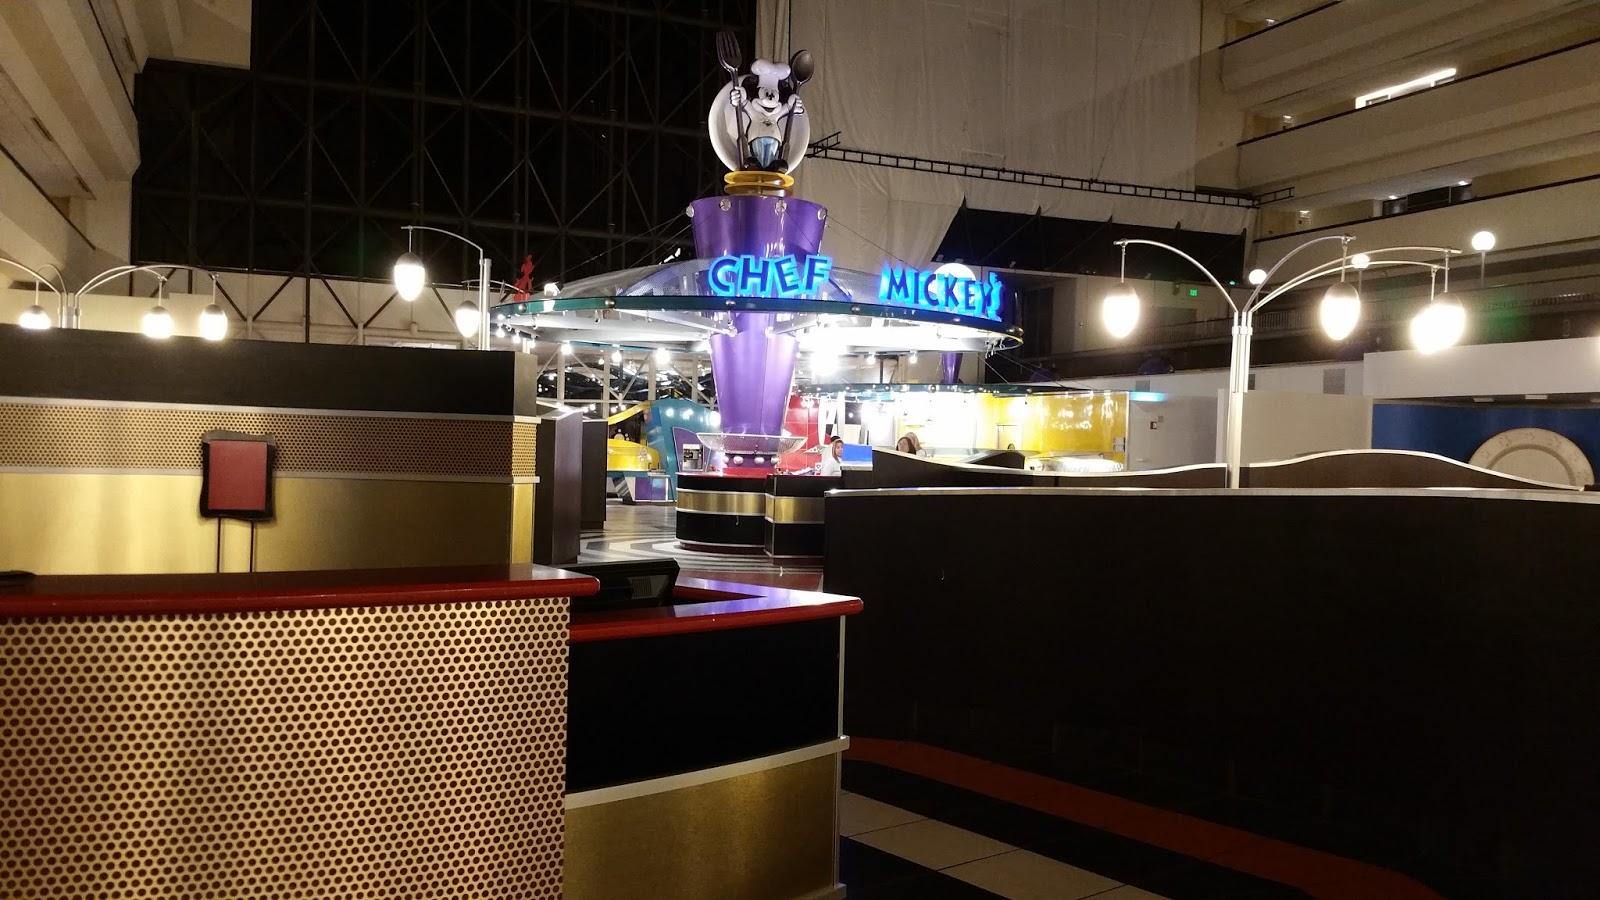 Travel Time Disneys Chef Mickeys Brunch at the Contemporary Resort